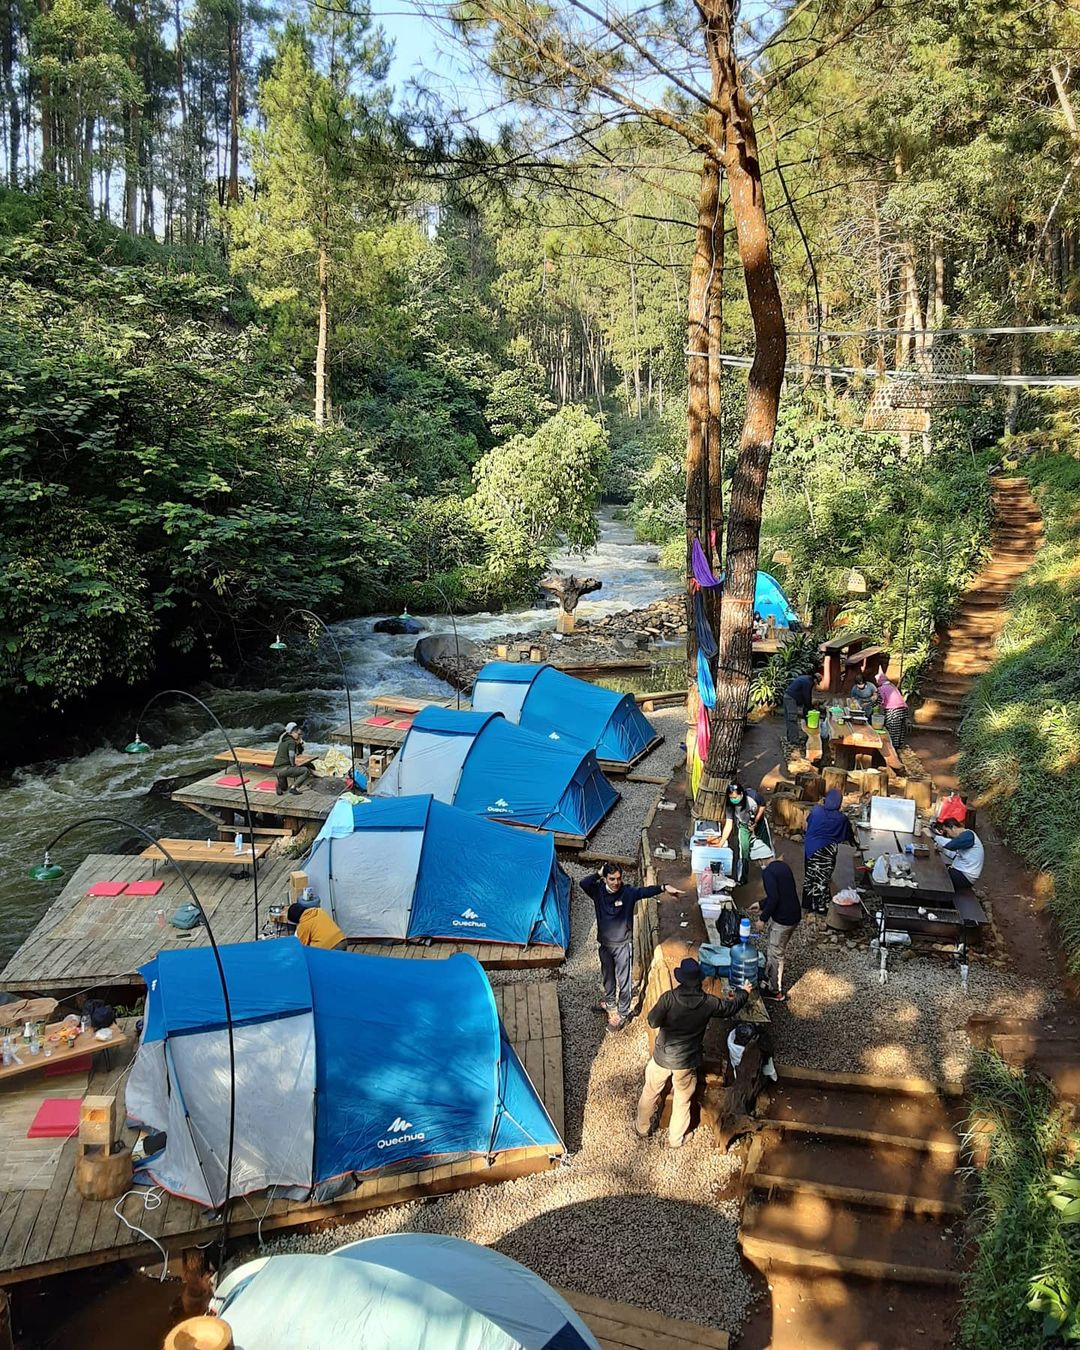 Suasana Pengunjung Di Pineus Tilu Riverside Image From @pineustilu